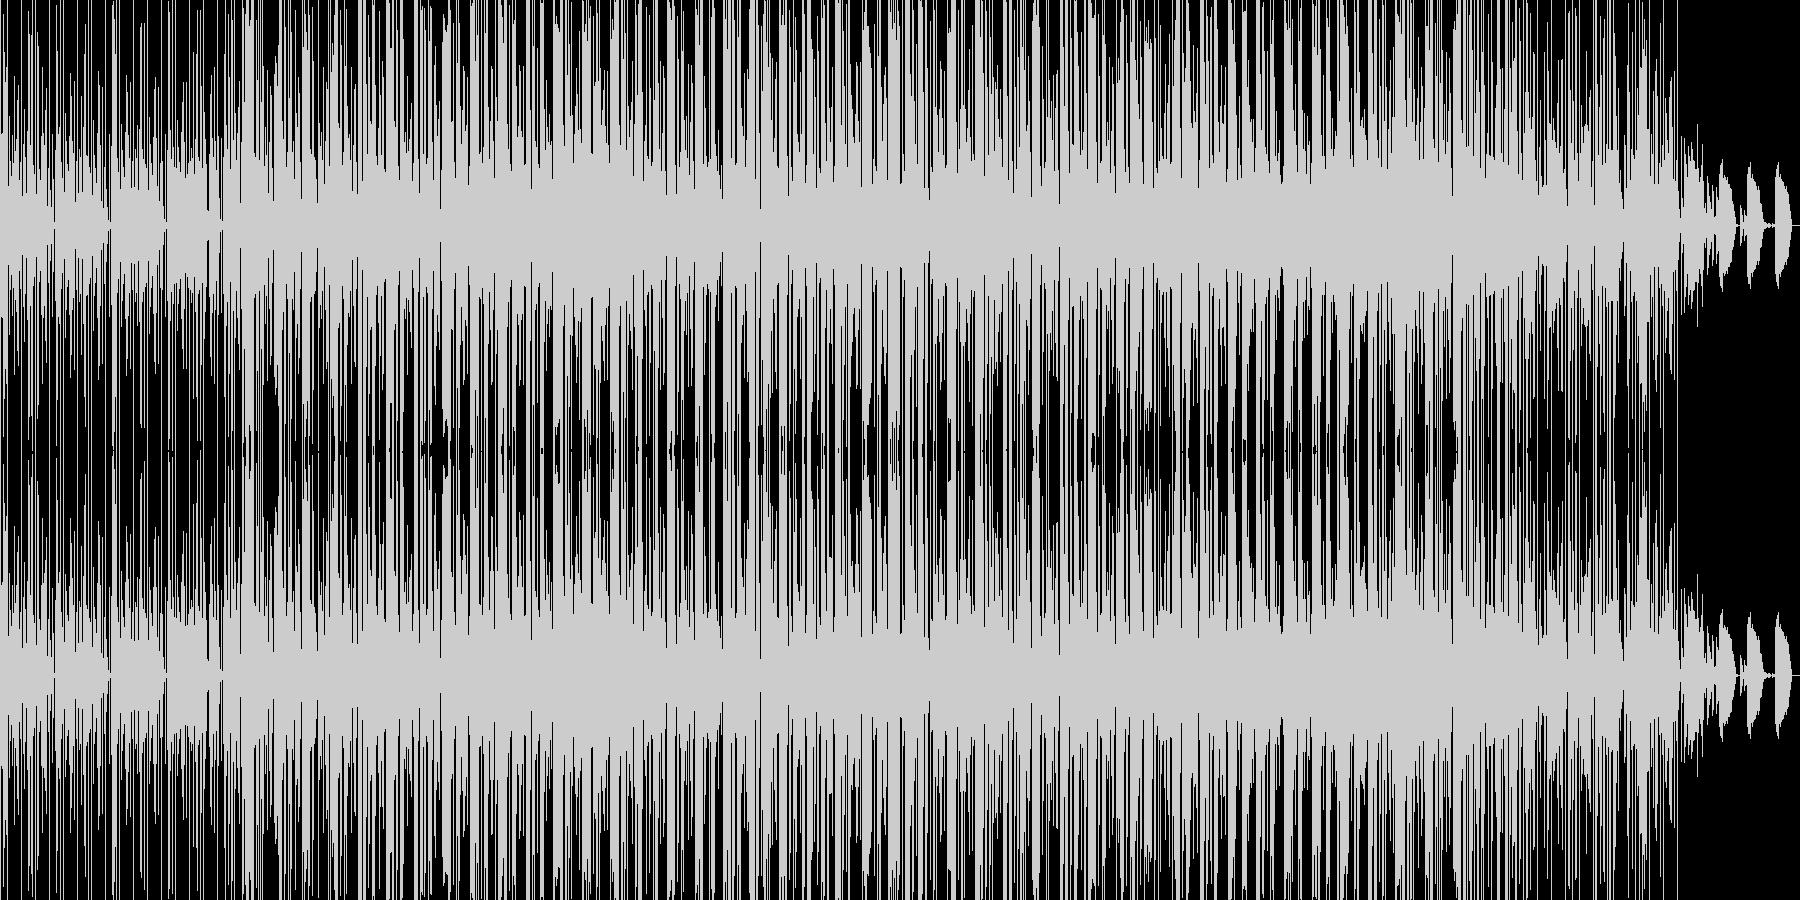 chillout beats 02の未再生の波形